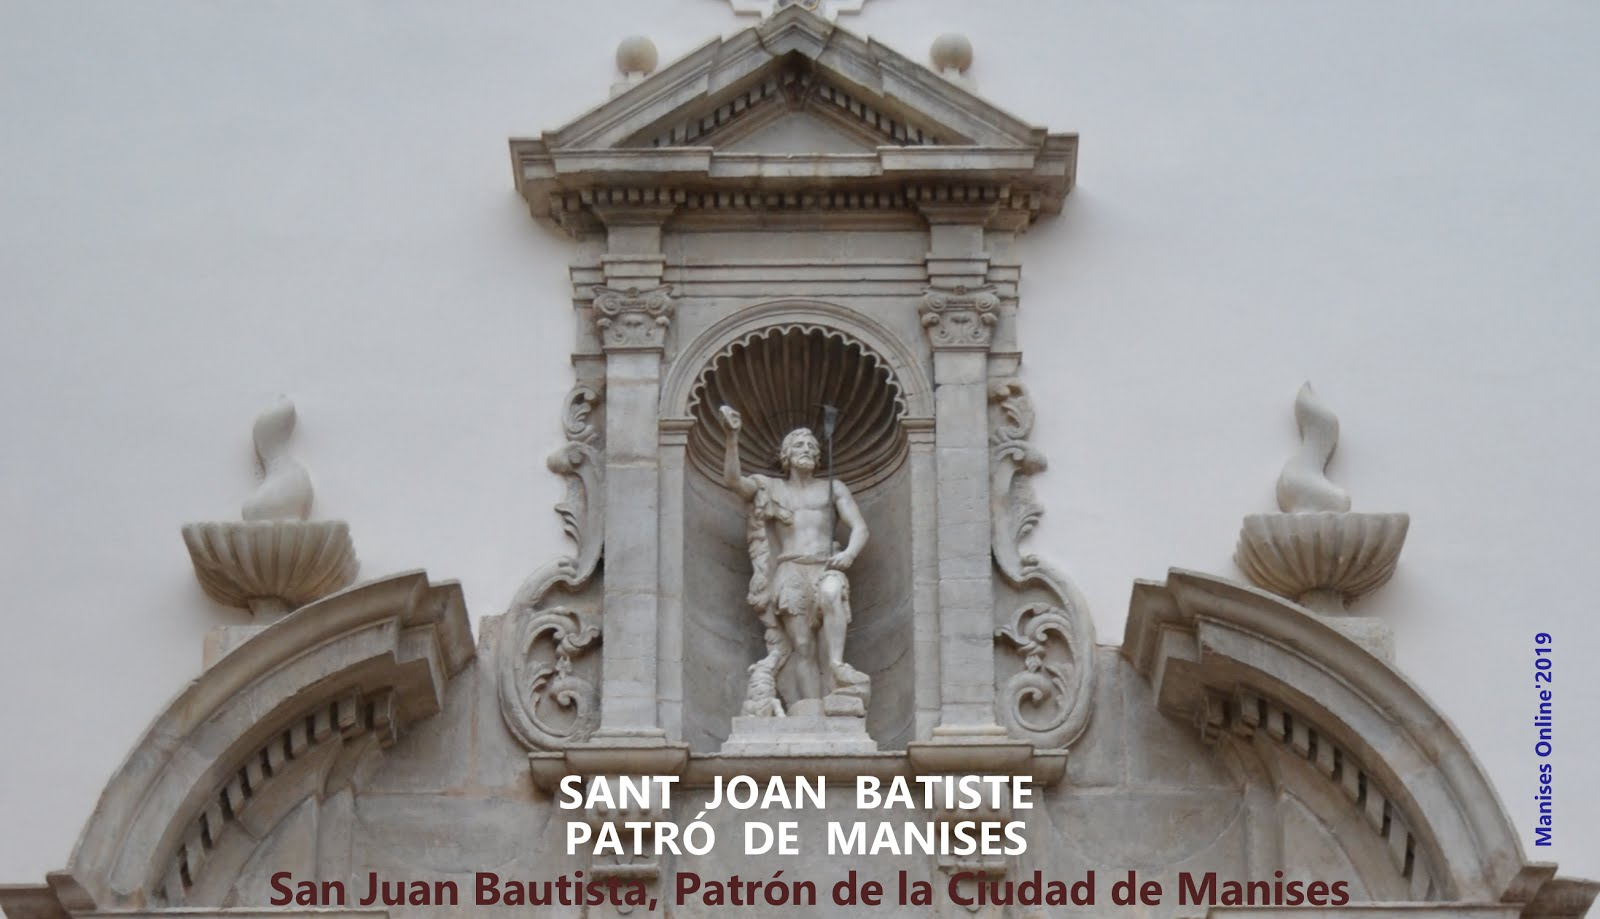 SANT JOAN BATISTE/SAN JUAN BAUTISTA, PATRÓN DE MANISES (VALENCIA · ESPAÑA)